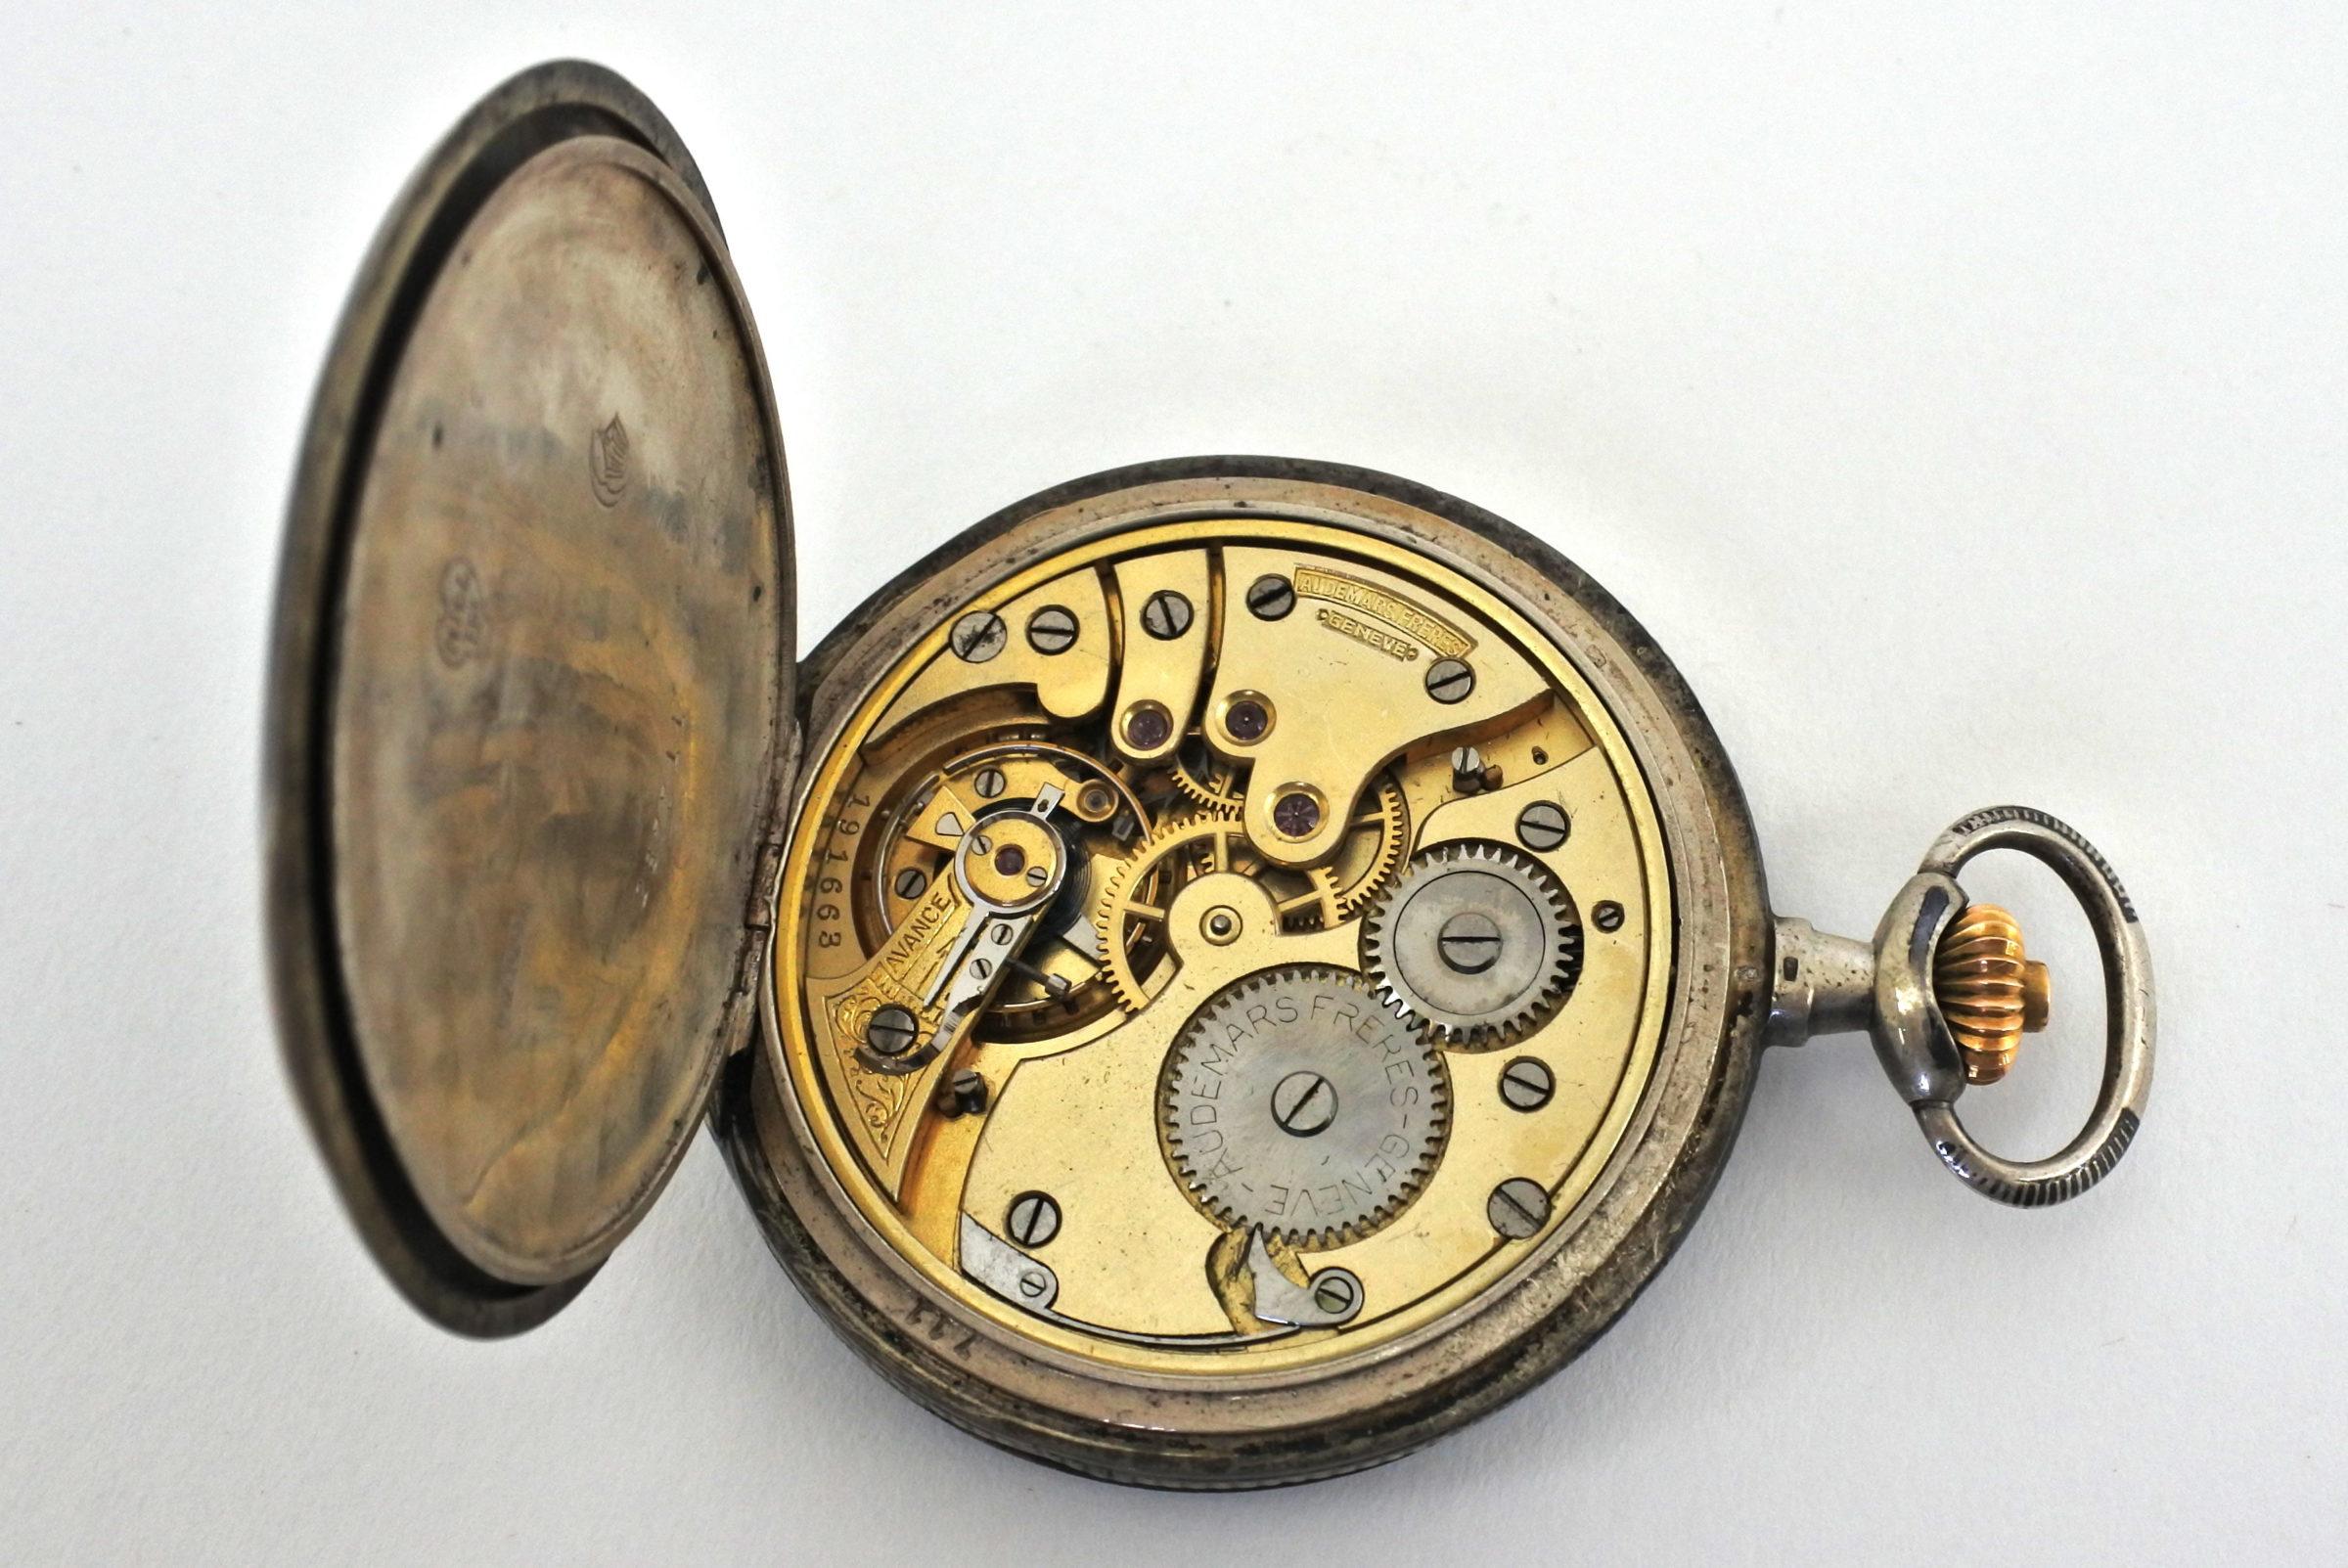 Orologio da tasca in argento e niello – Audemars Piguet Genève - 4